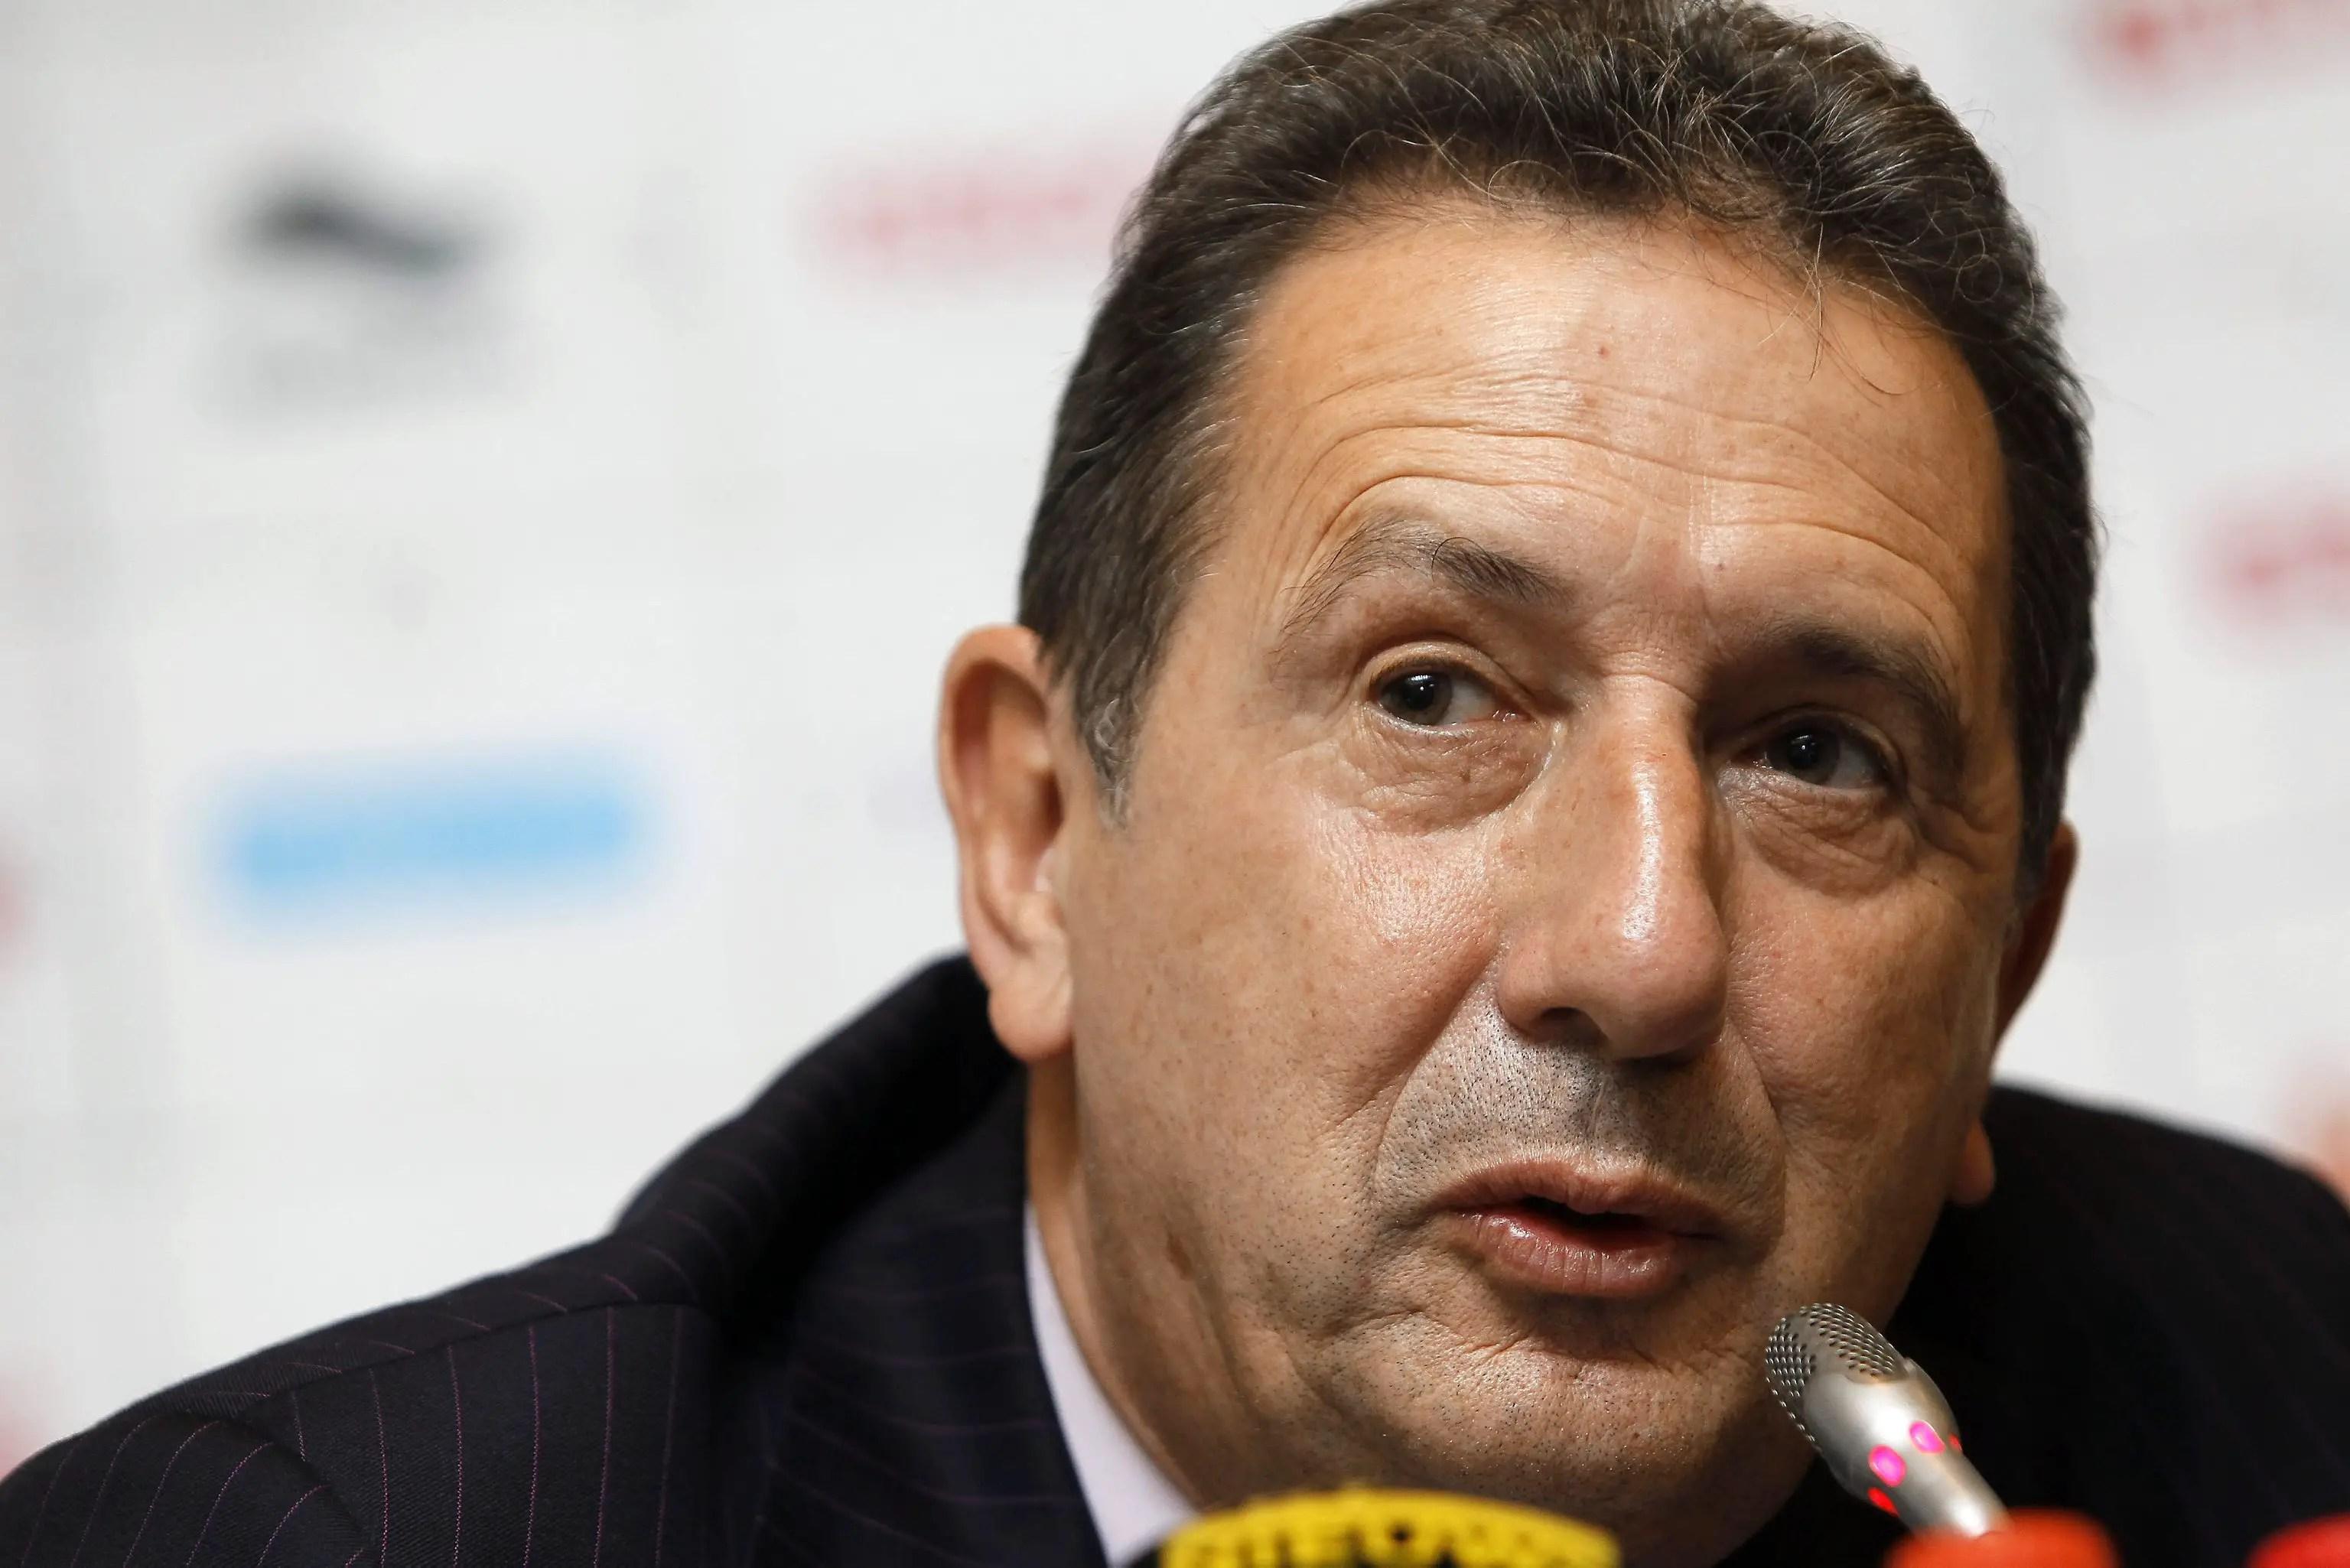 AFCON 2017: Algeria Coach Leekens Resigns